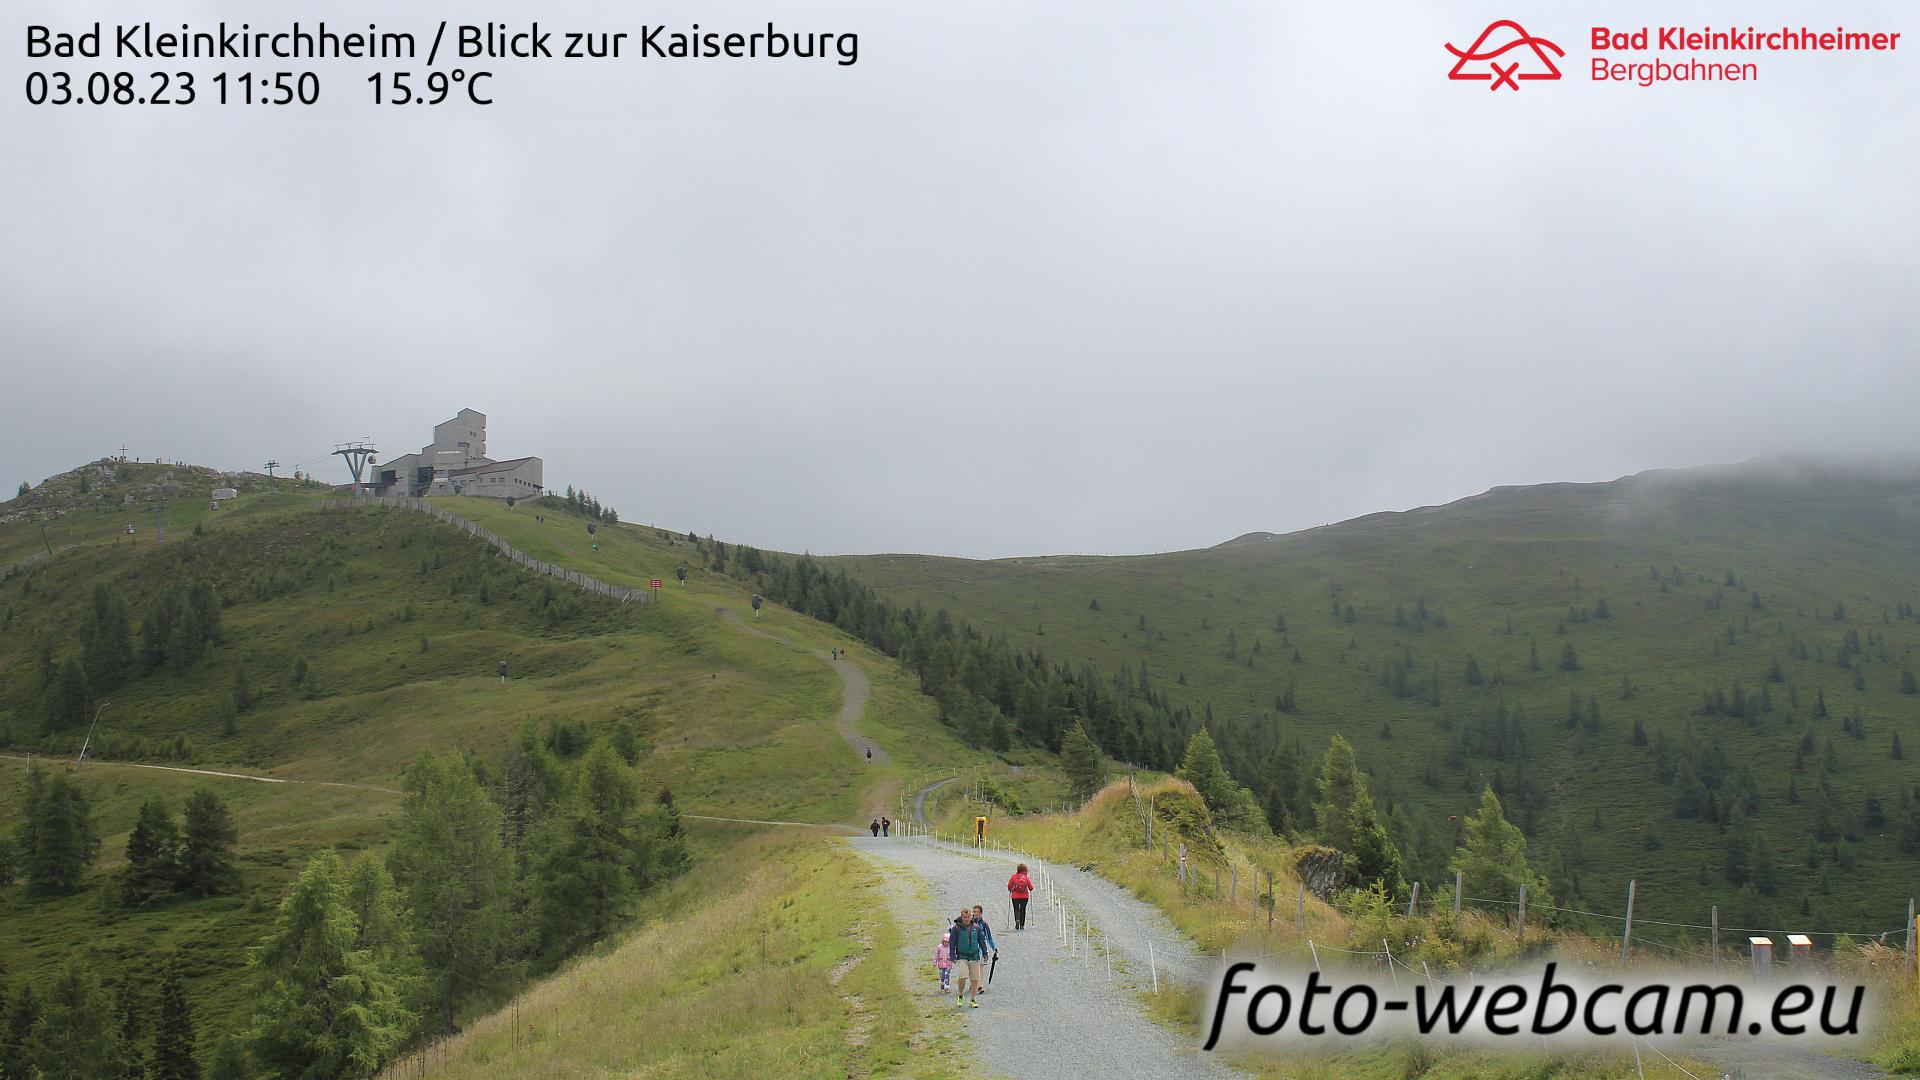 Bad Kleinkirchheim Thu. 11:23